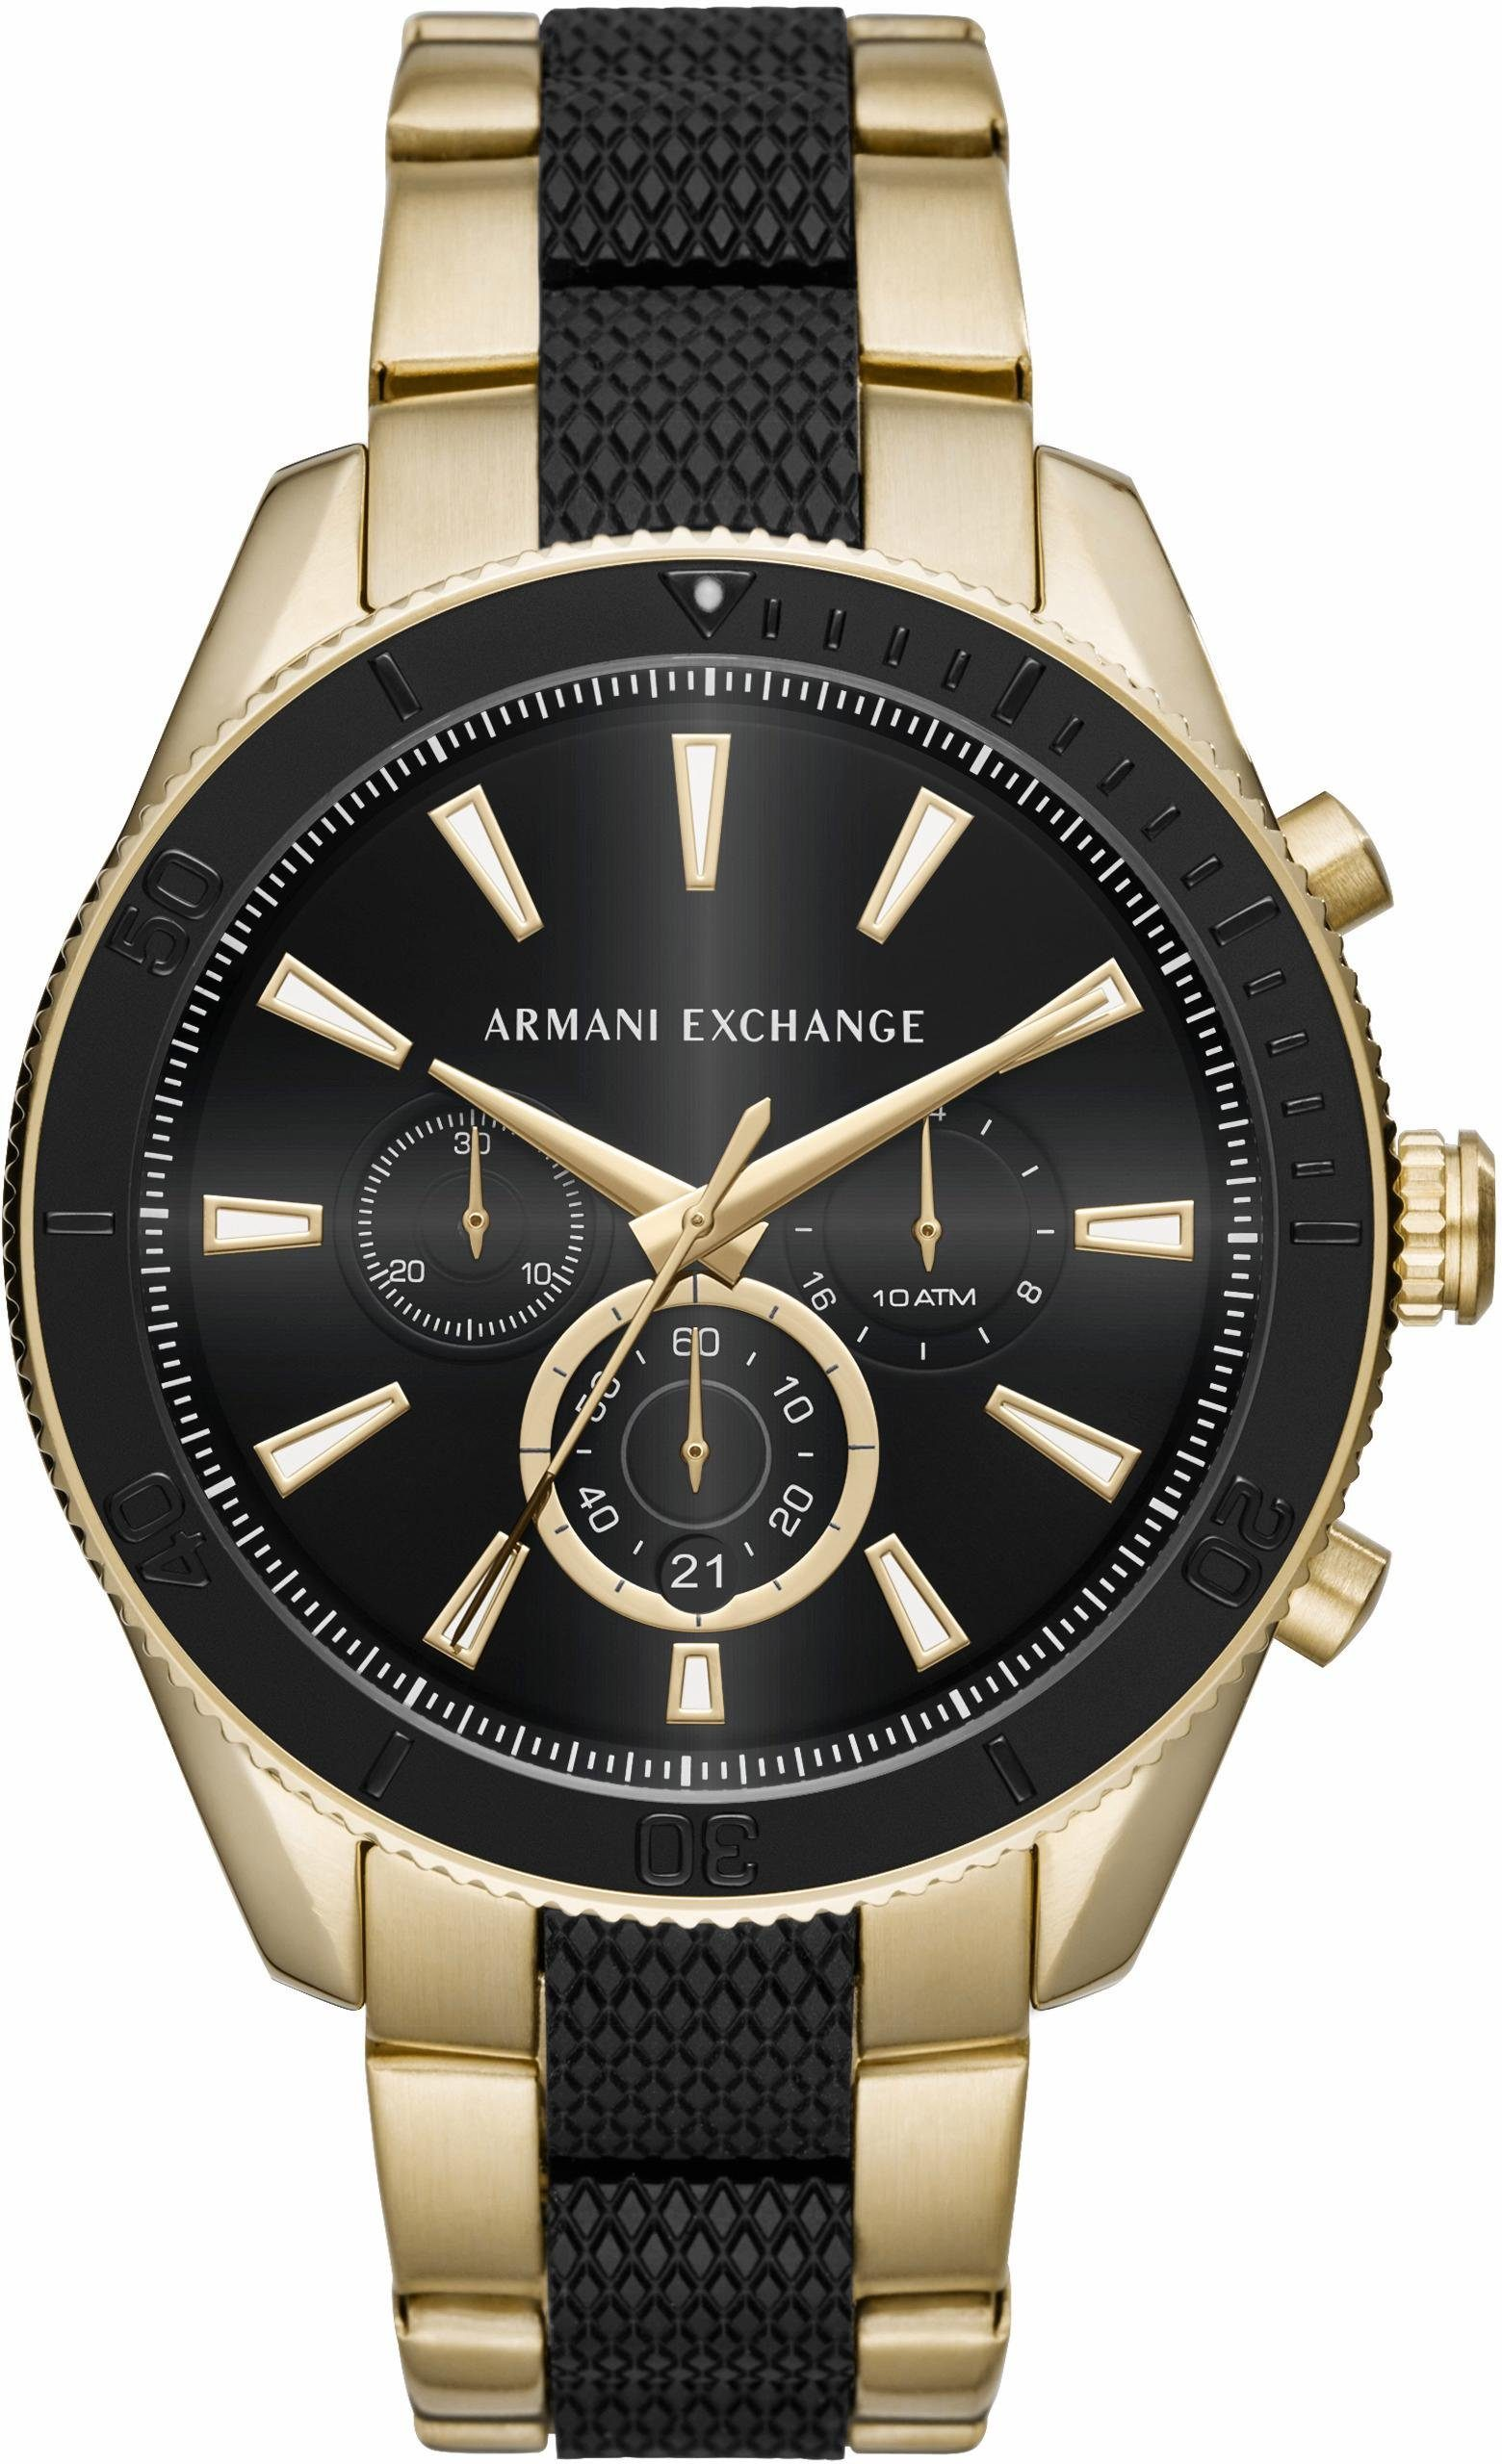 Exchange KaufenOtto Online Chronograph Armani »ax1814« y7bf6g